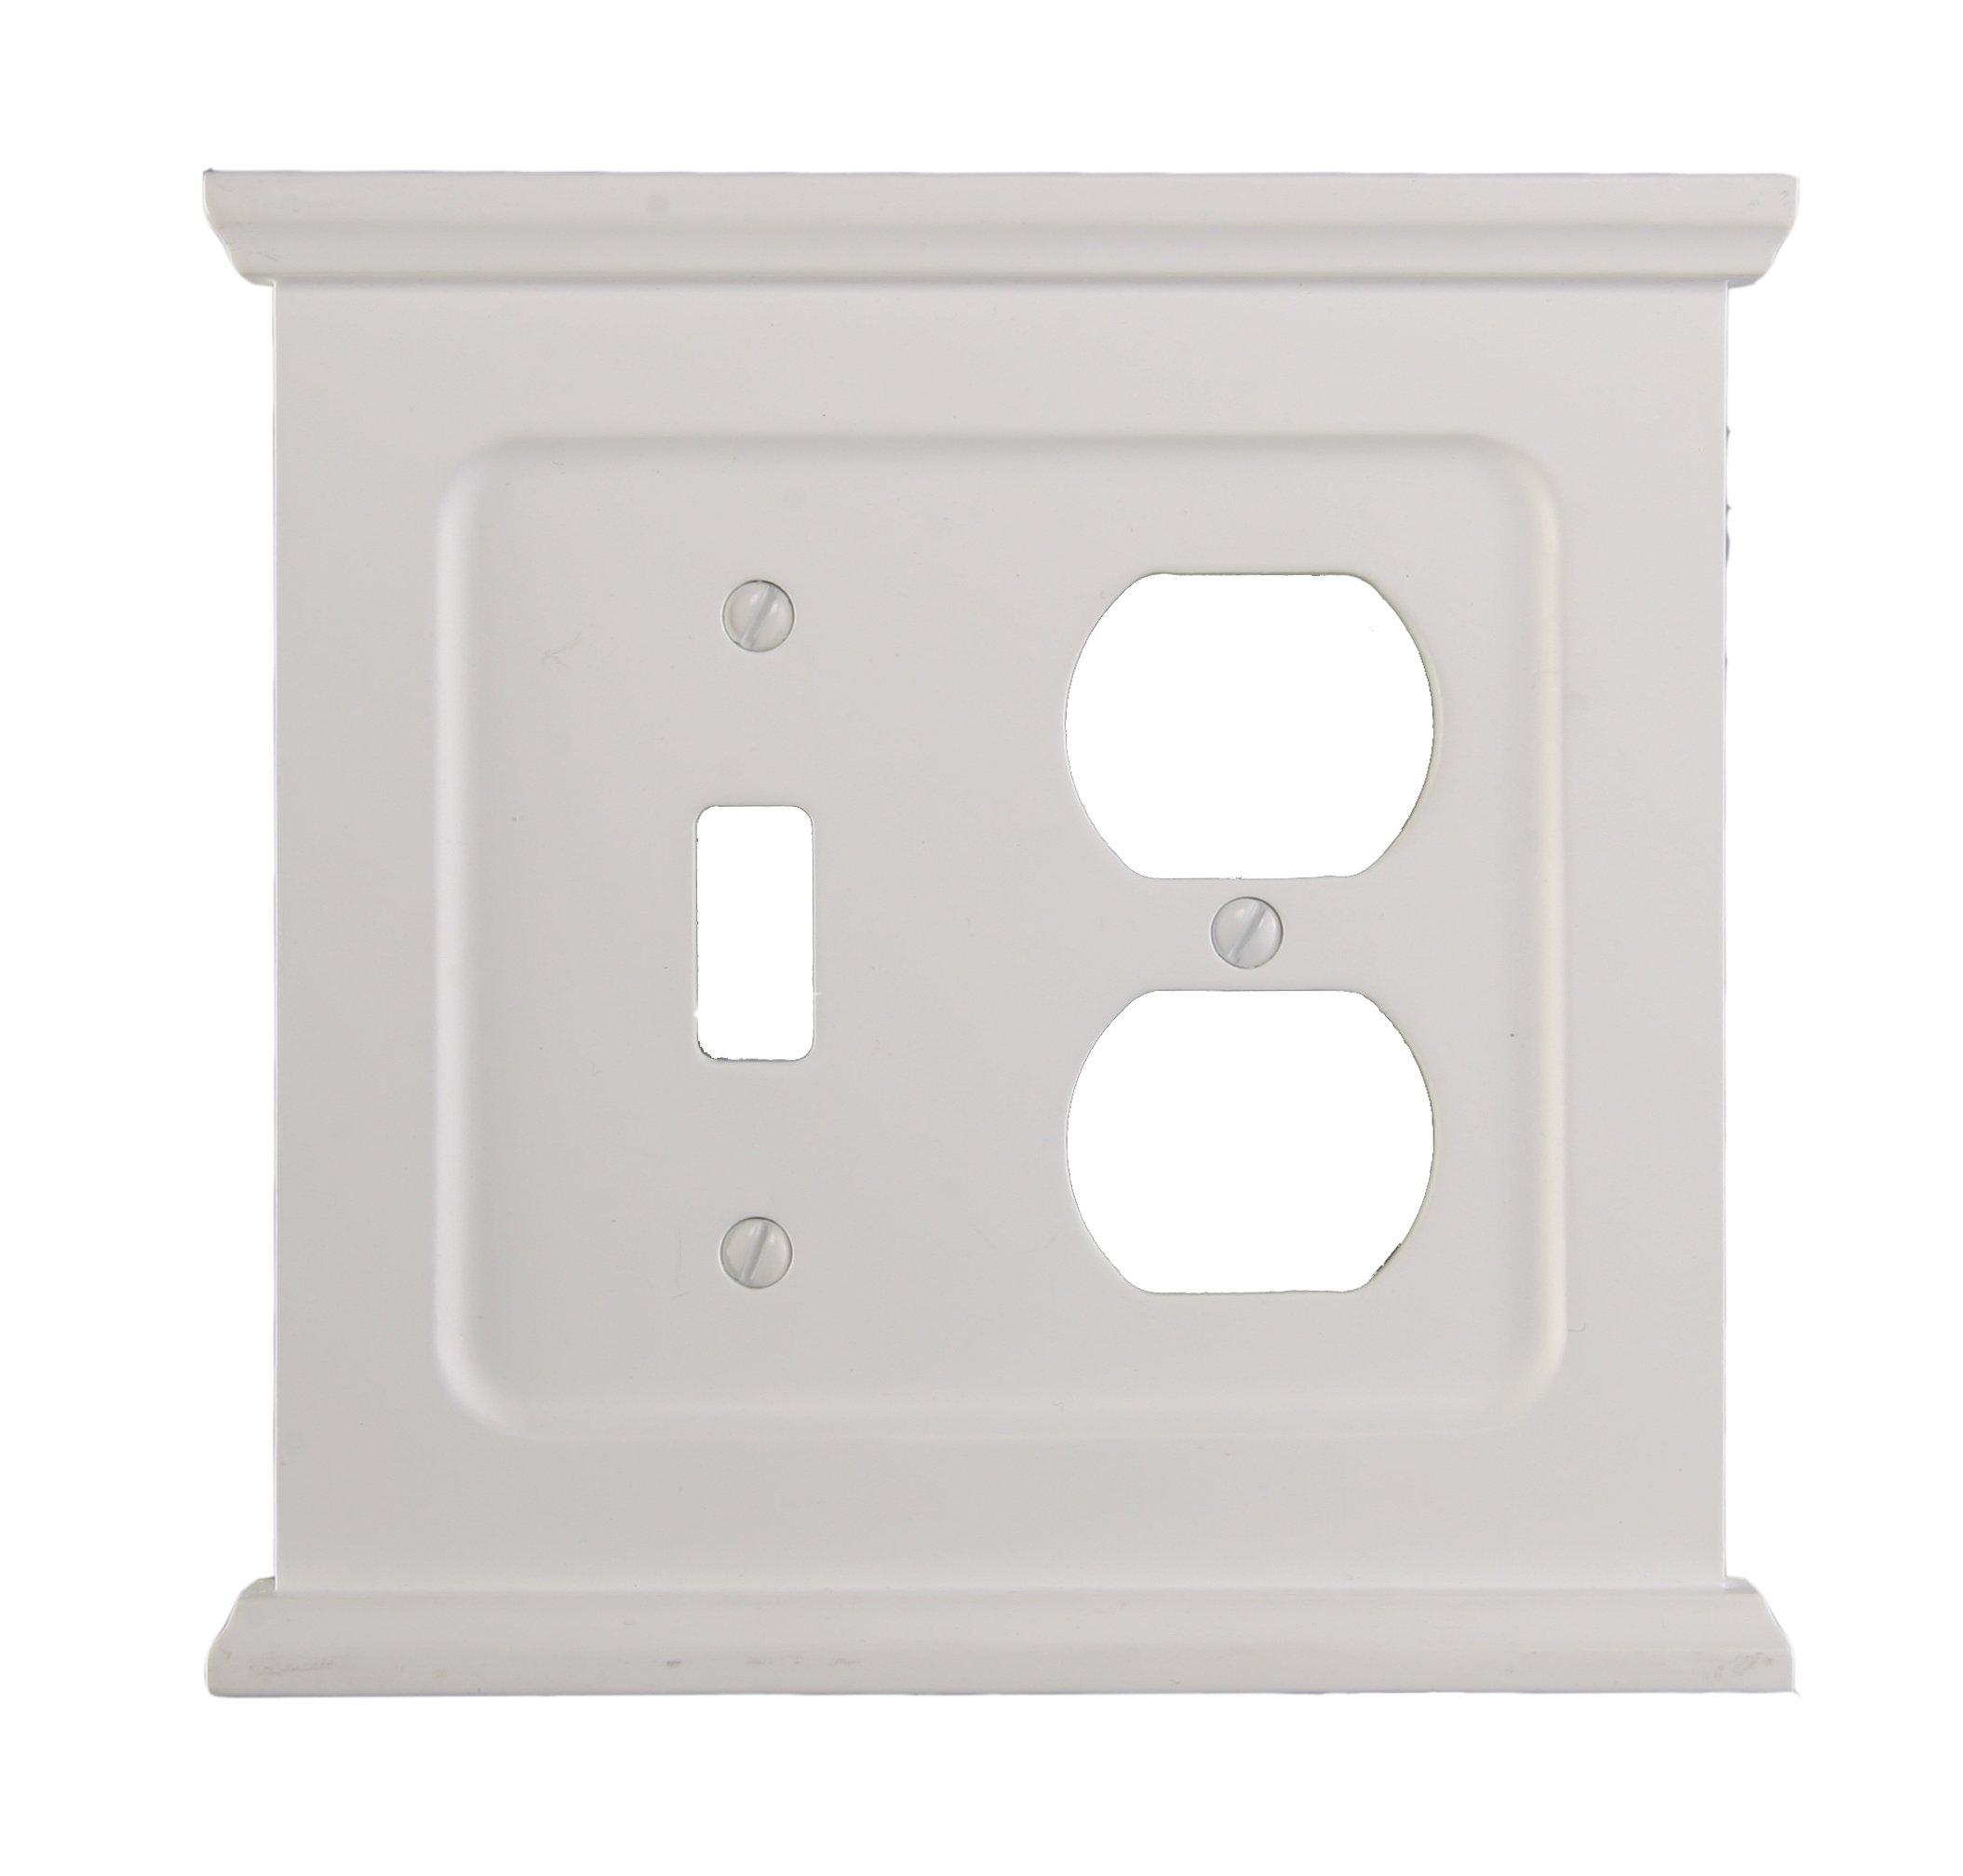 AmerTac SB178TDW Mantel Composite Wood Single Toggle/Single Duplex Wallplate, White